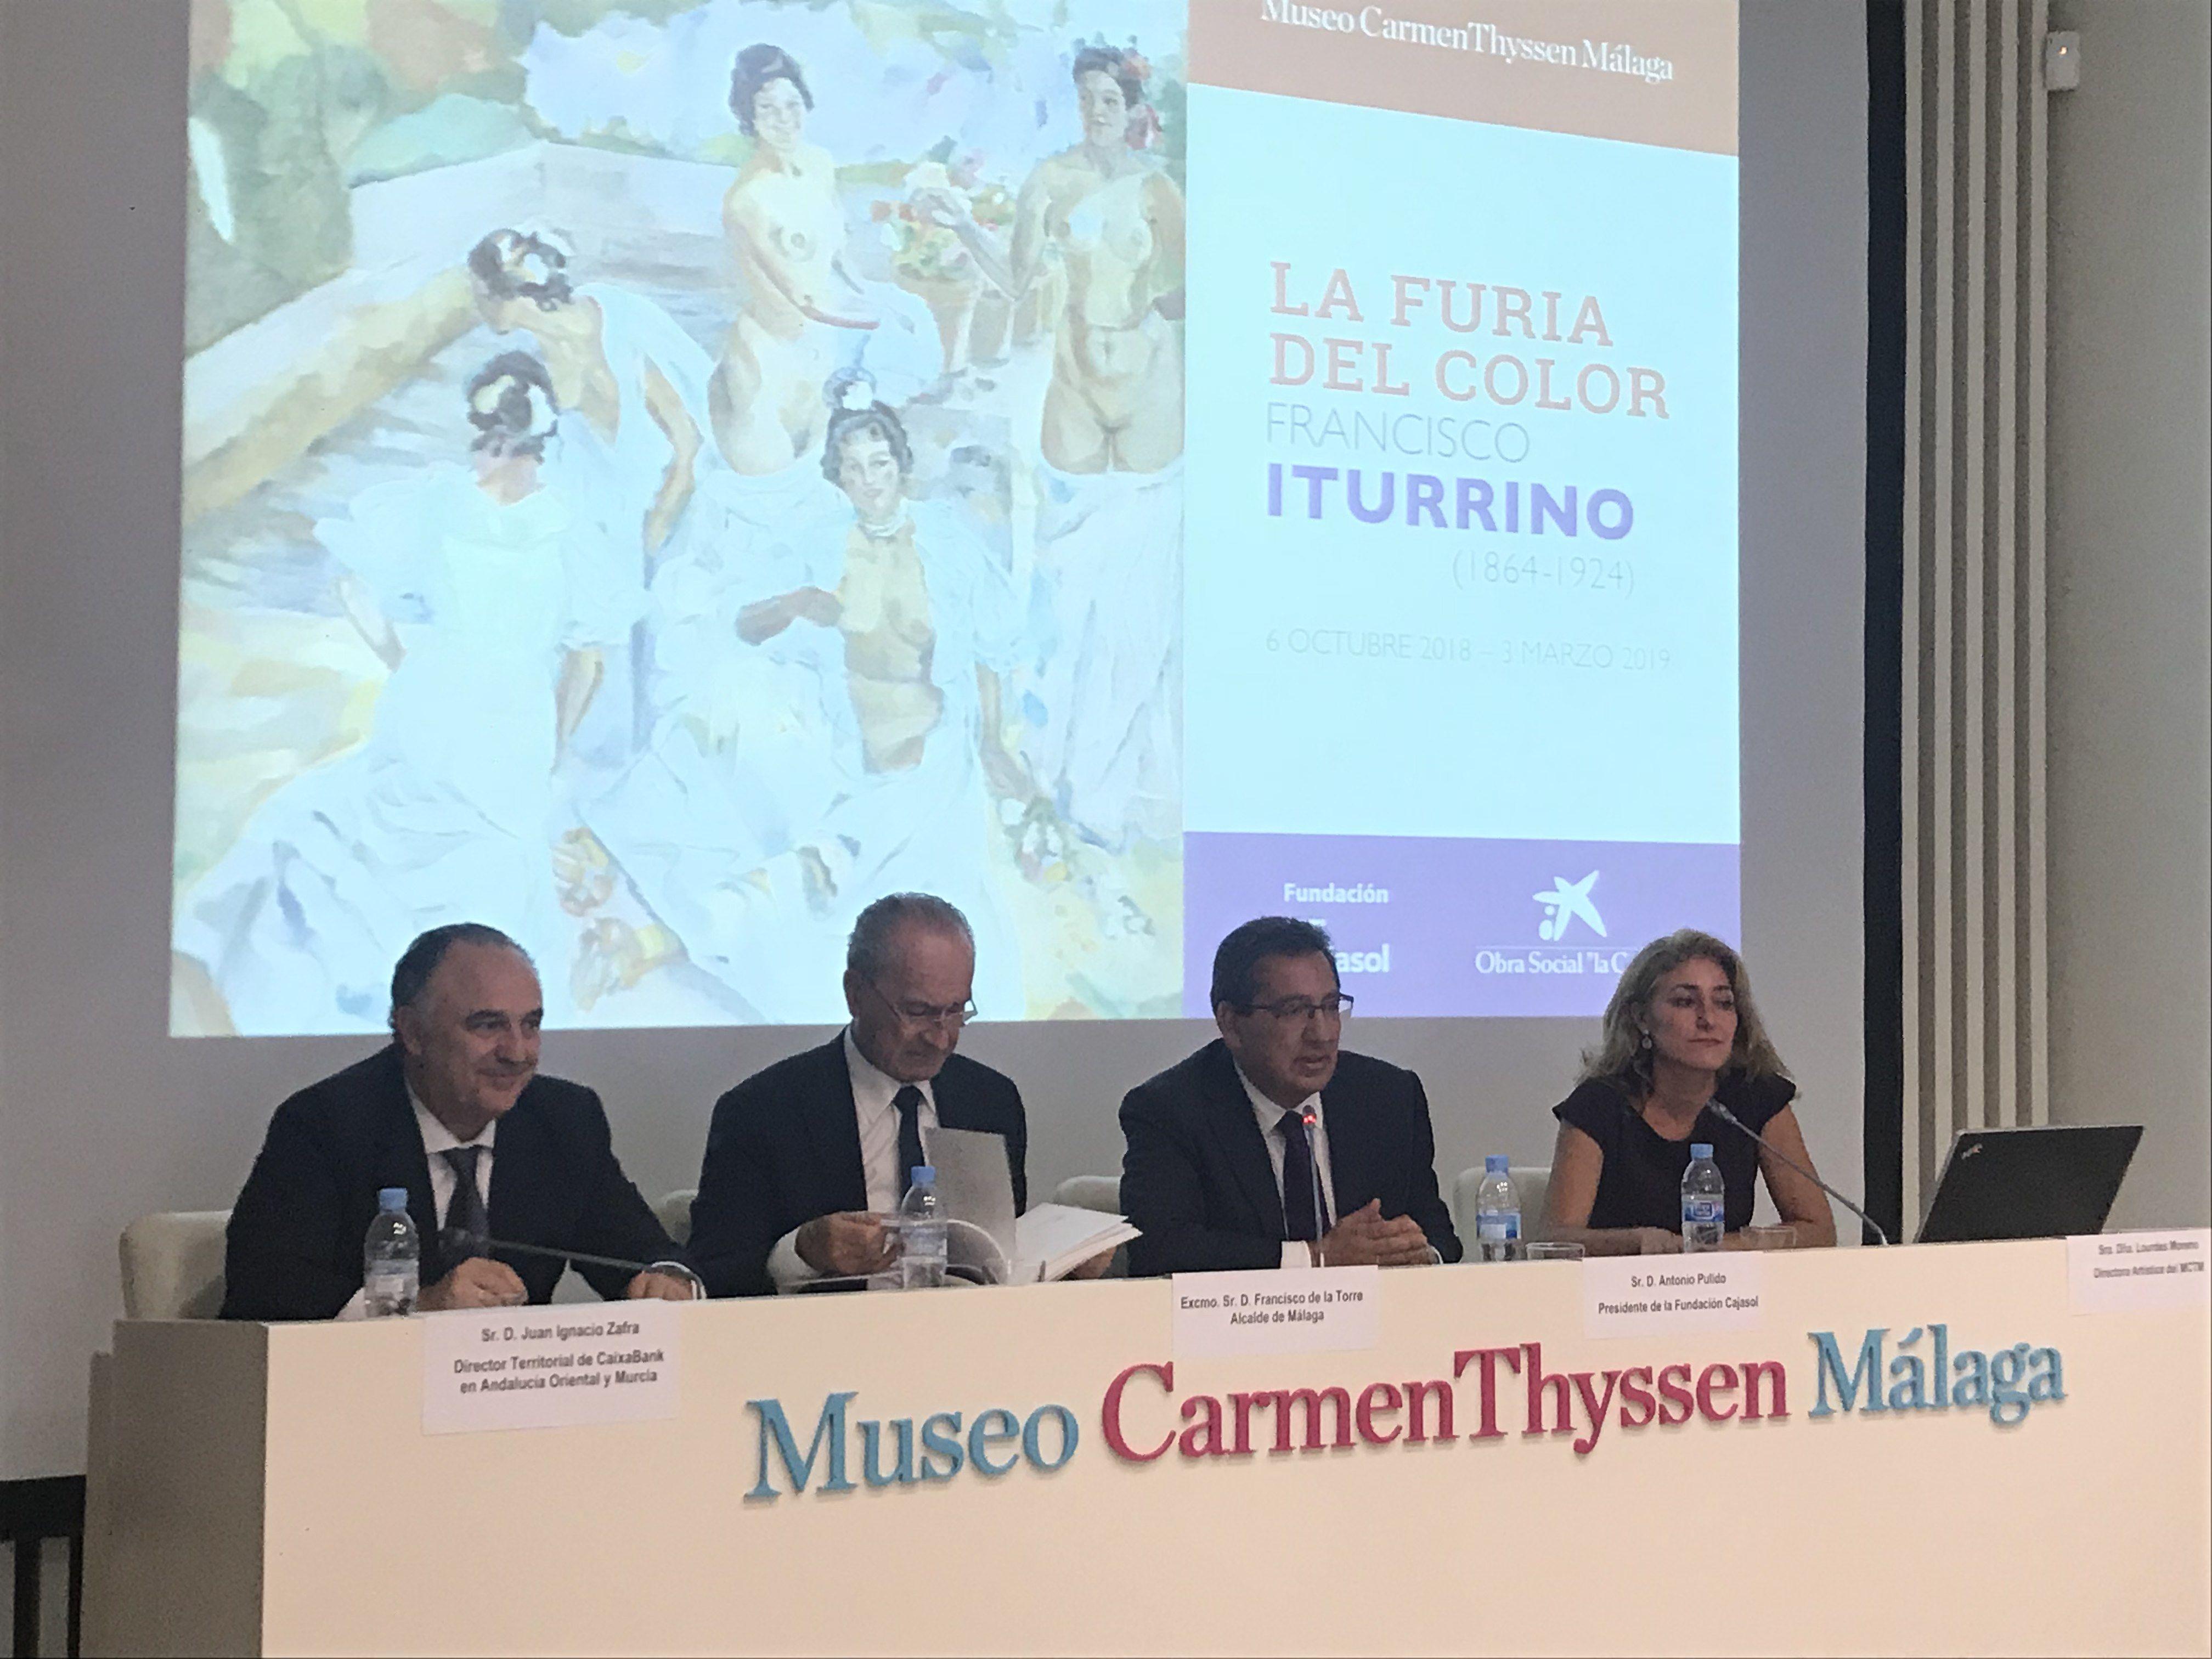 Museo Carmen Thyssen acoge exposición sobre Francisco Iturrino con colaboración de Cajasol y Caixa